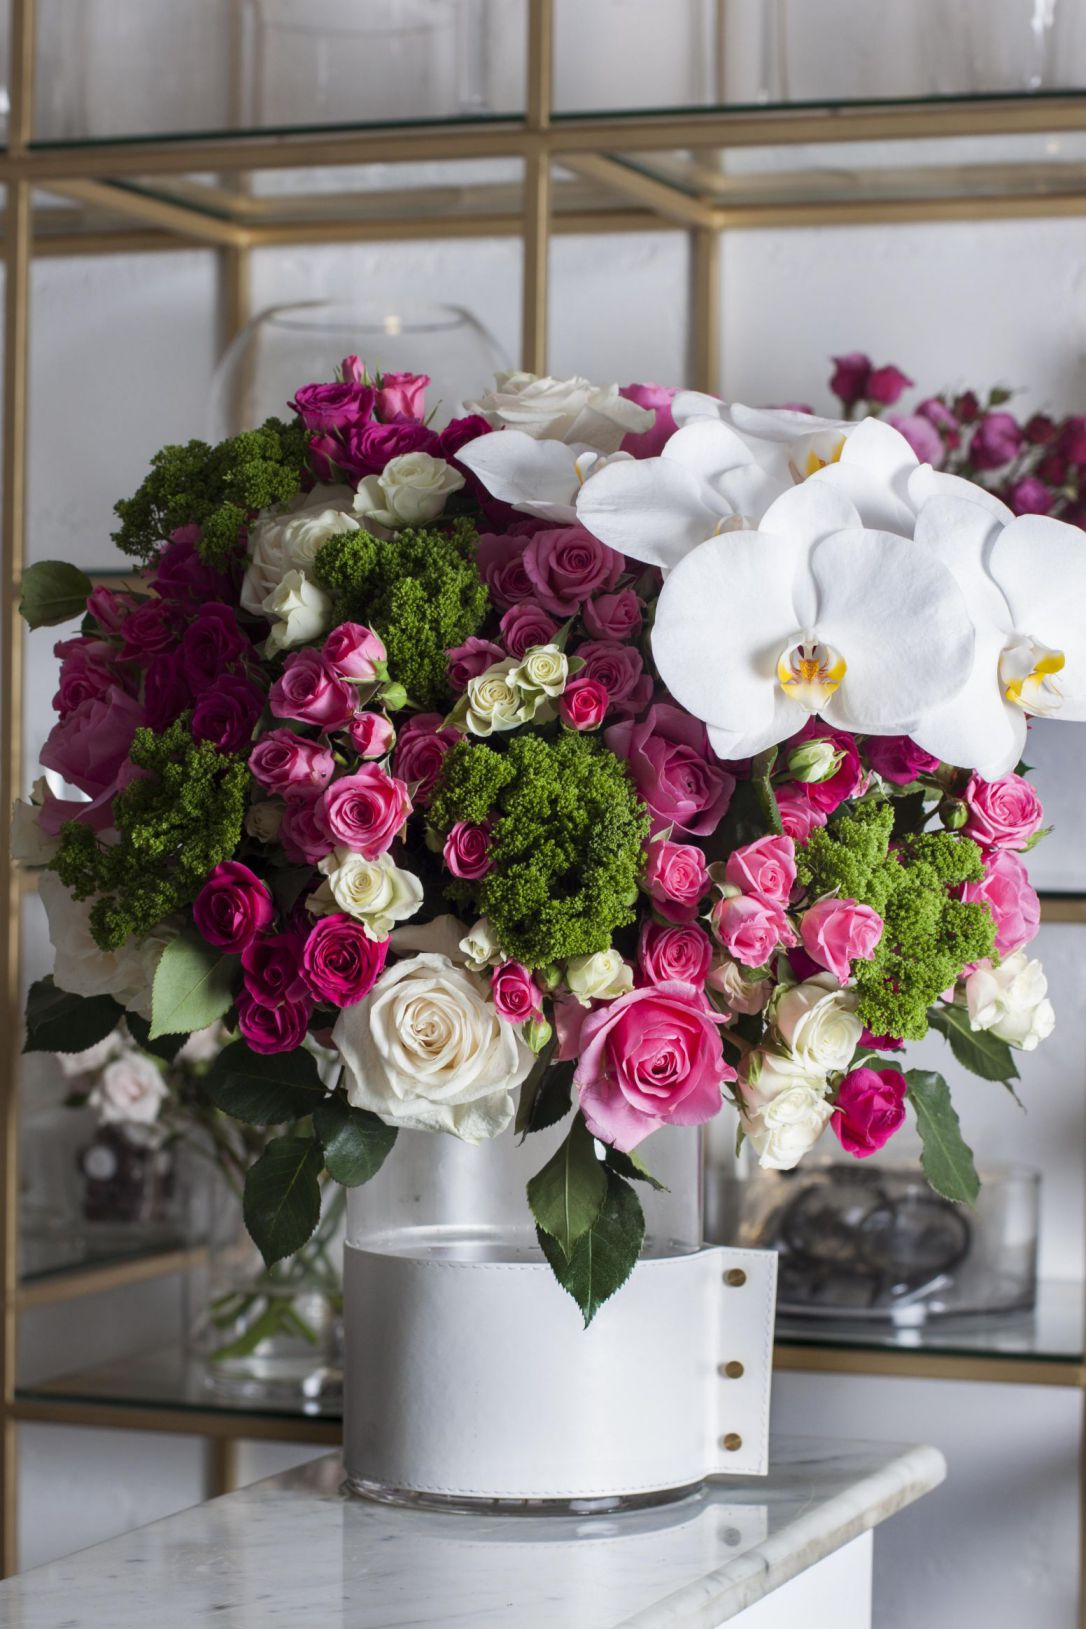 White Leather Vase Flower with Base